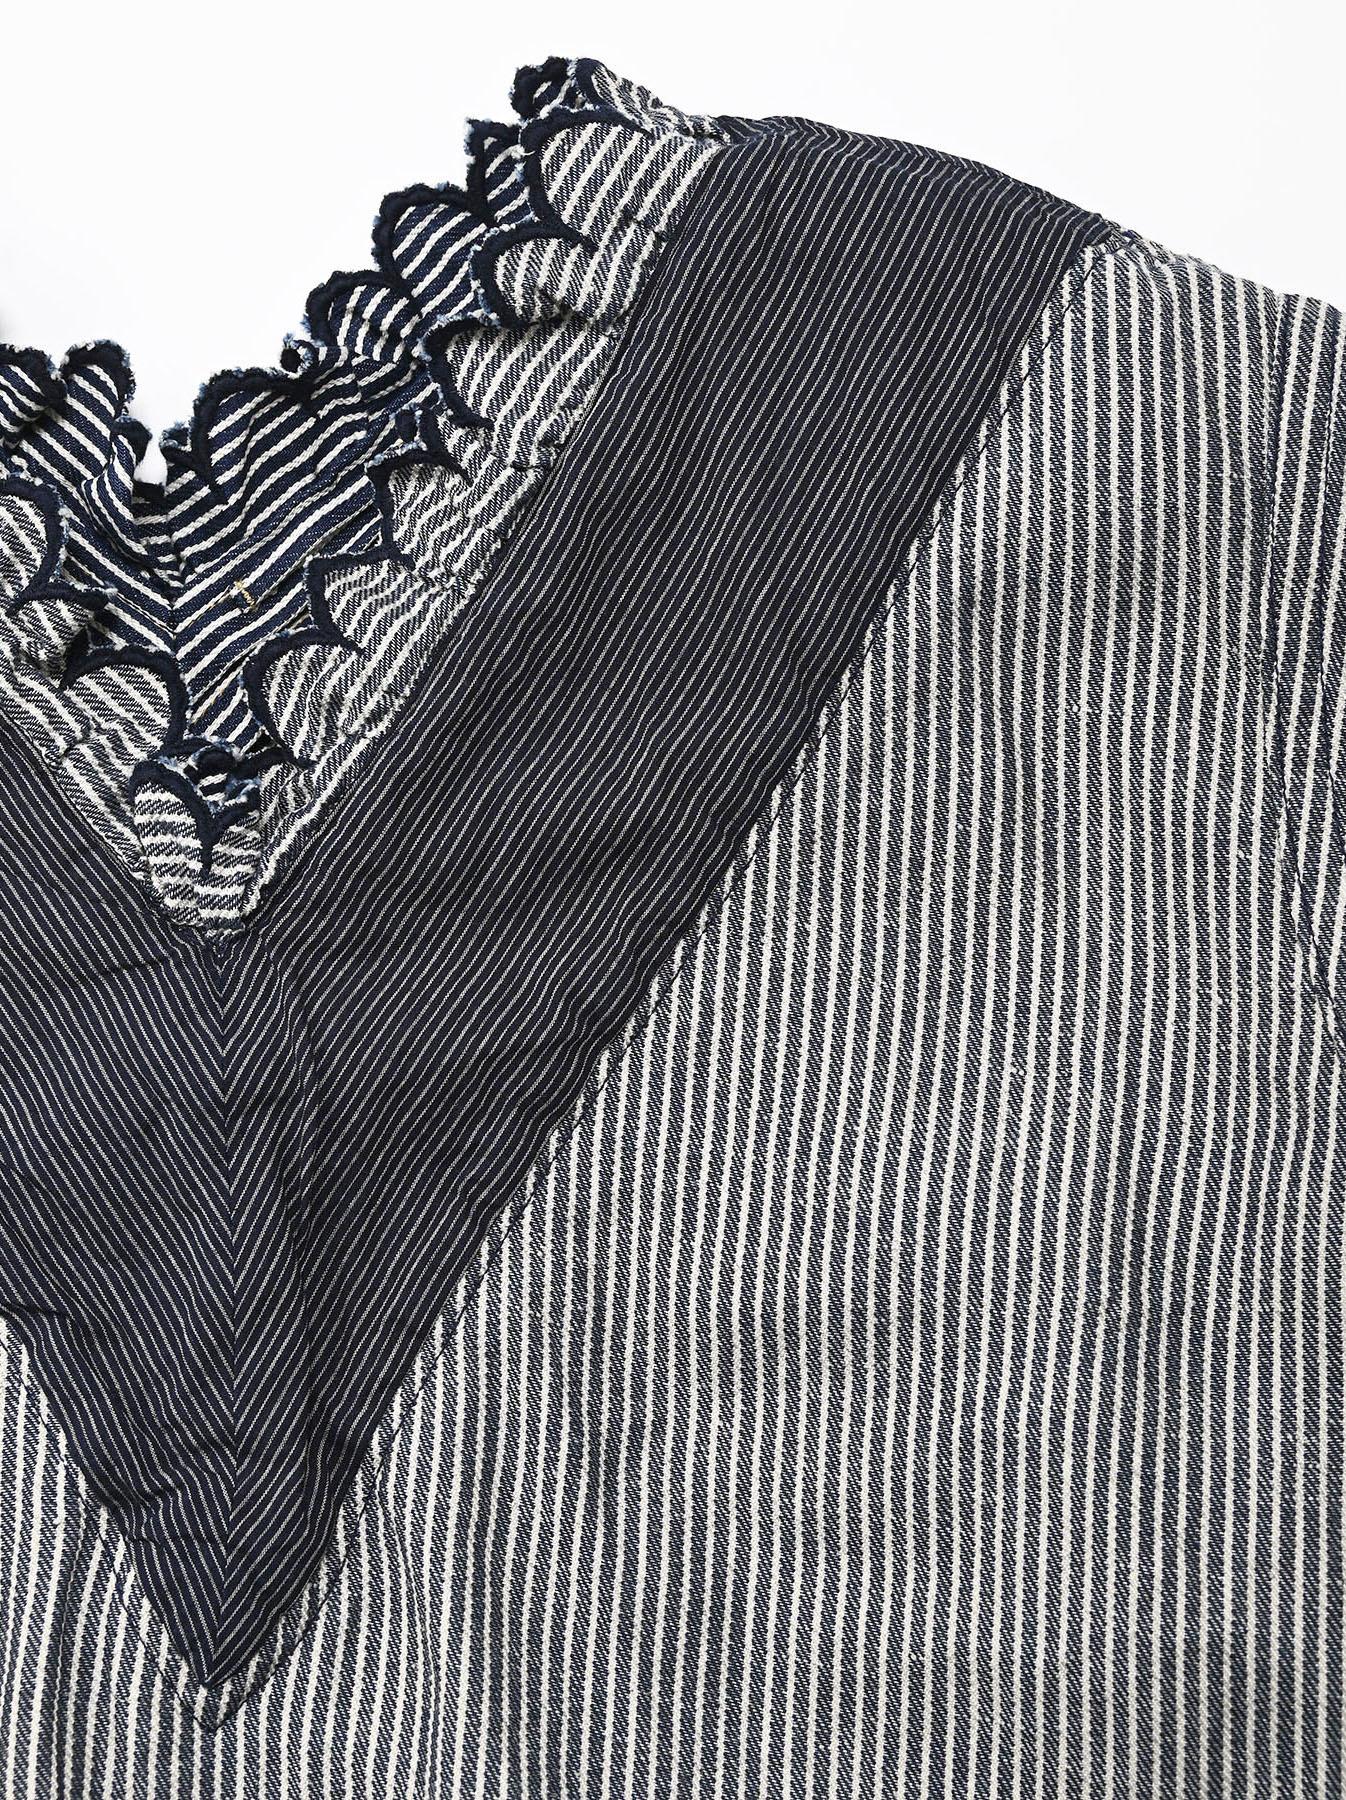 Komugi Denim Tuck Lace T-shirt-7